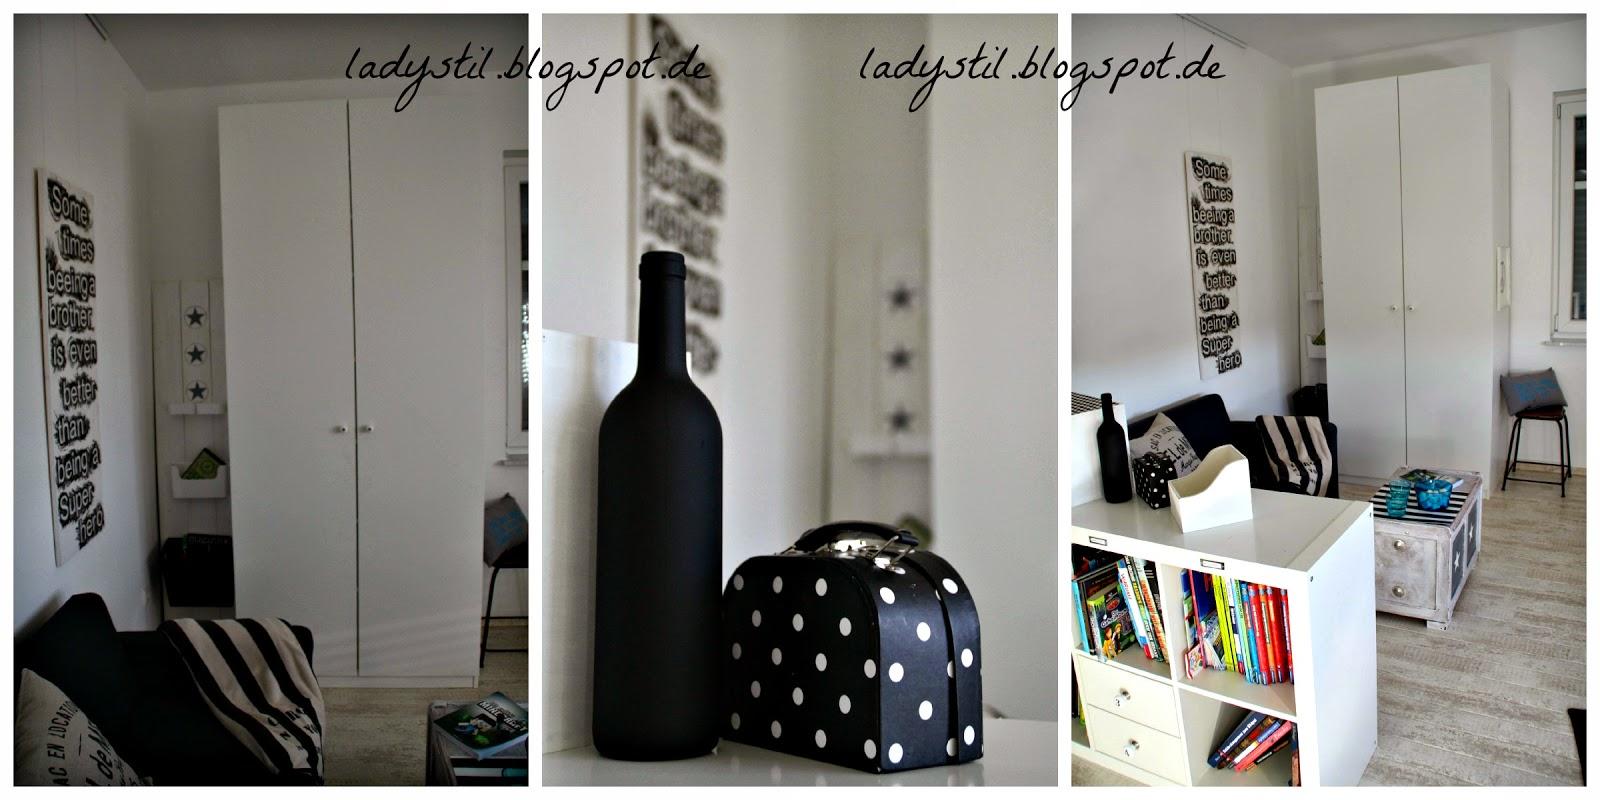 Lampe Ikea Qui Change De Couleur ~ Mittwoch, 29 Oktober 2014